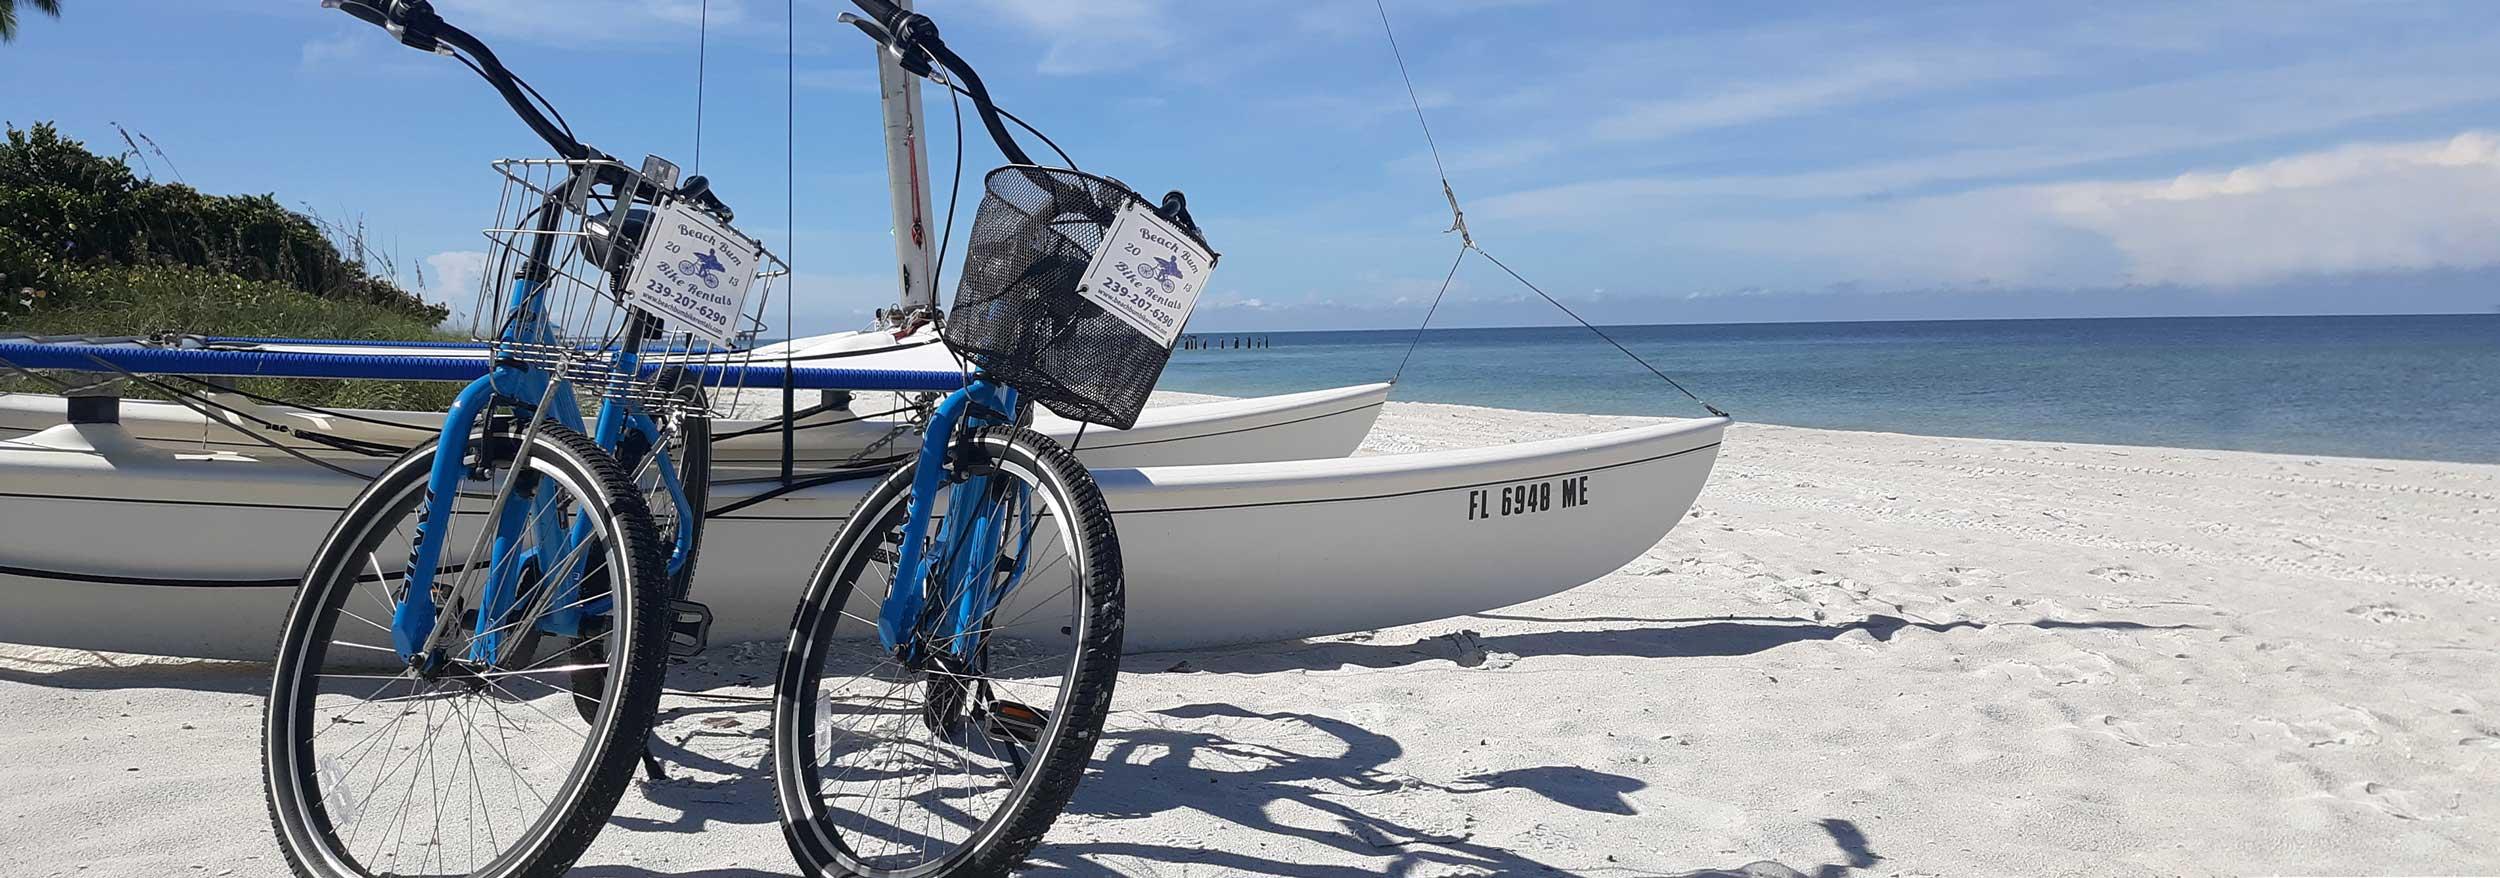 Bike rentals with sailboat on Naples, Florida beach   Beach Bum Bike Rentals and Delivery Naples, Florida